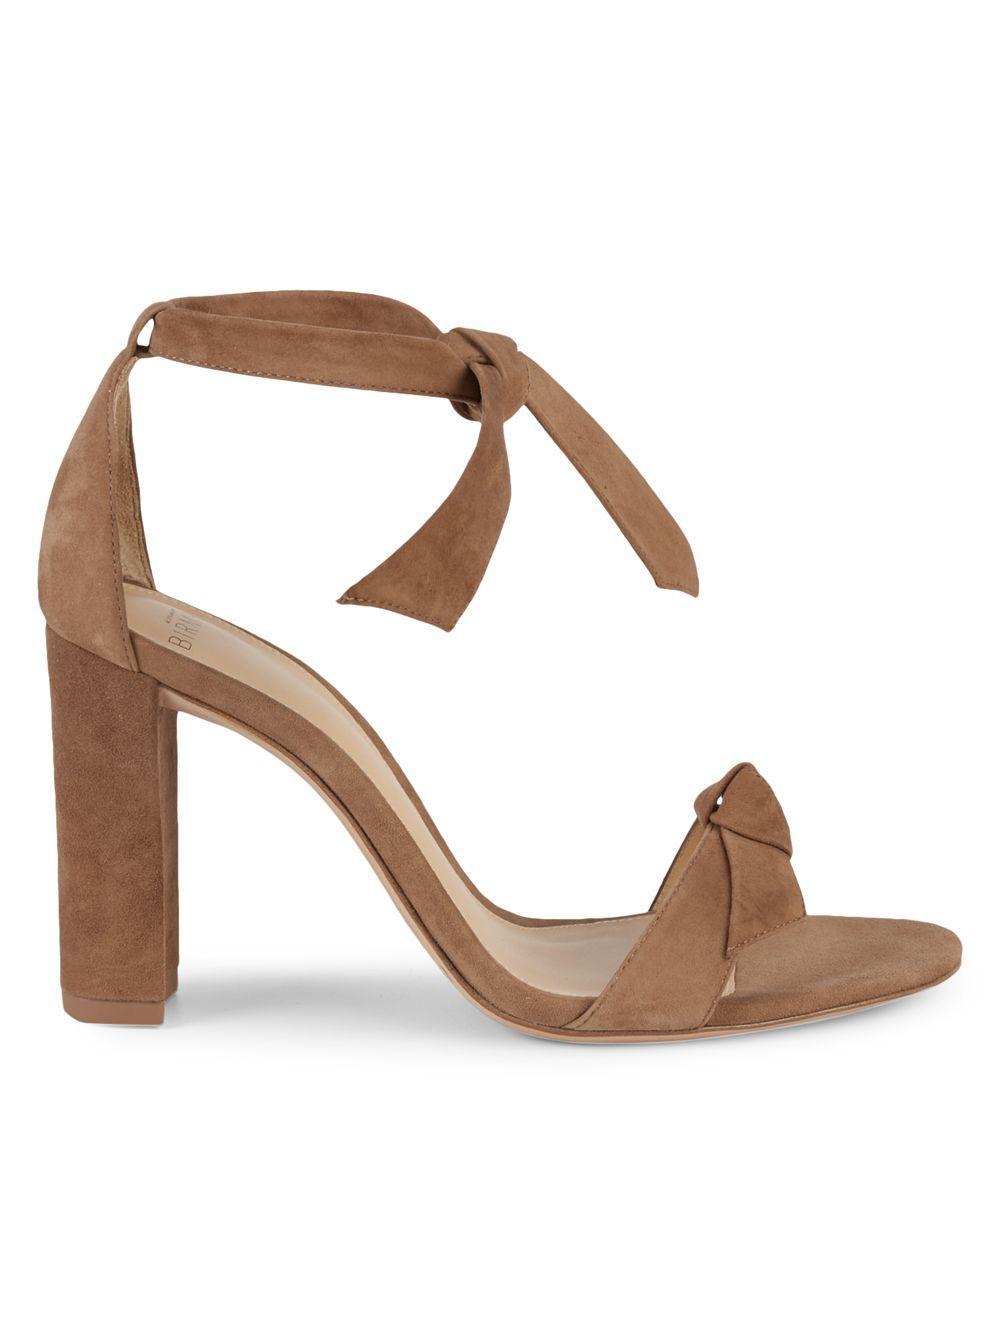 d58881abb2b Lyst - Alexandre Birman Clarita Suede Heeled Sandals in Natural